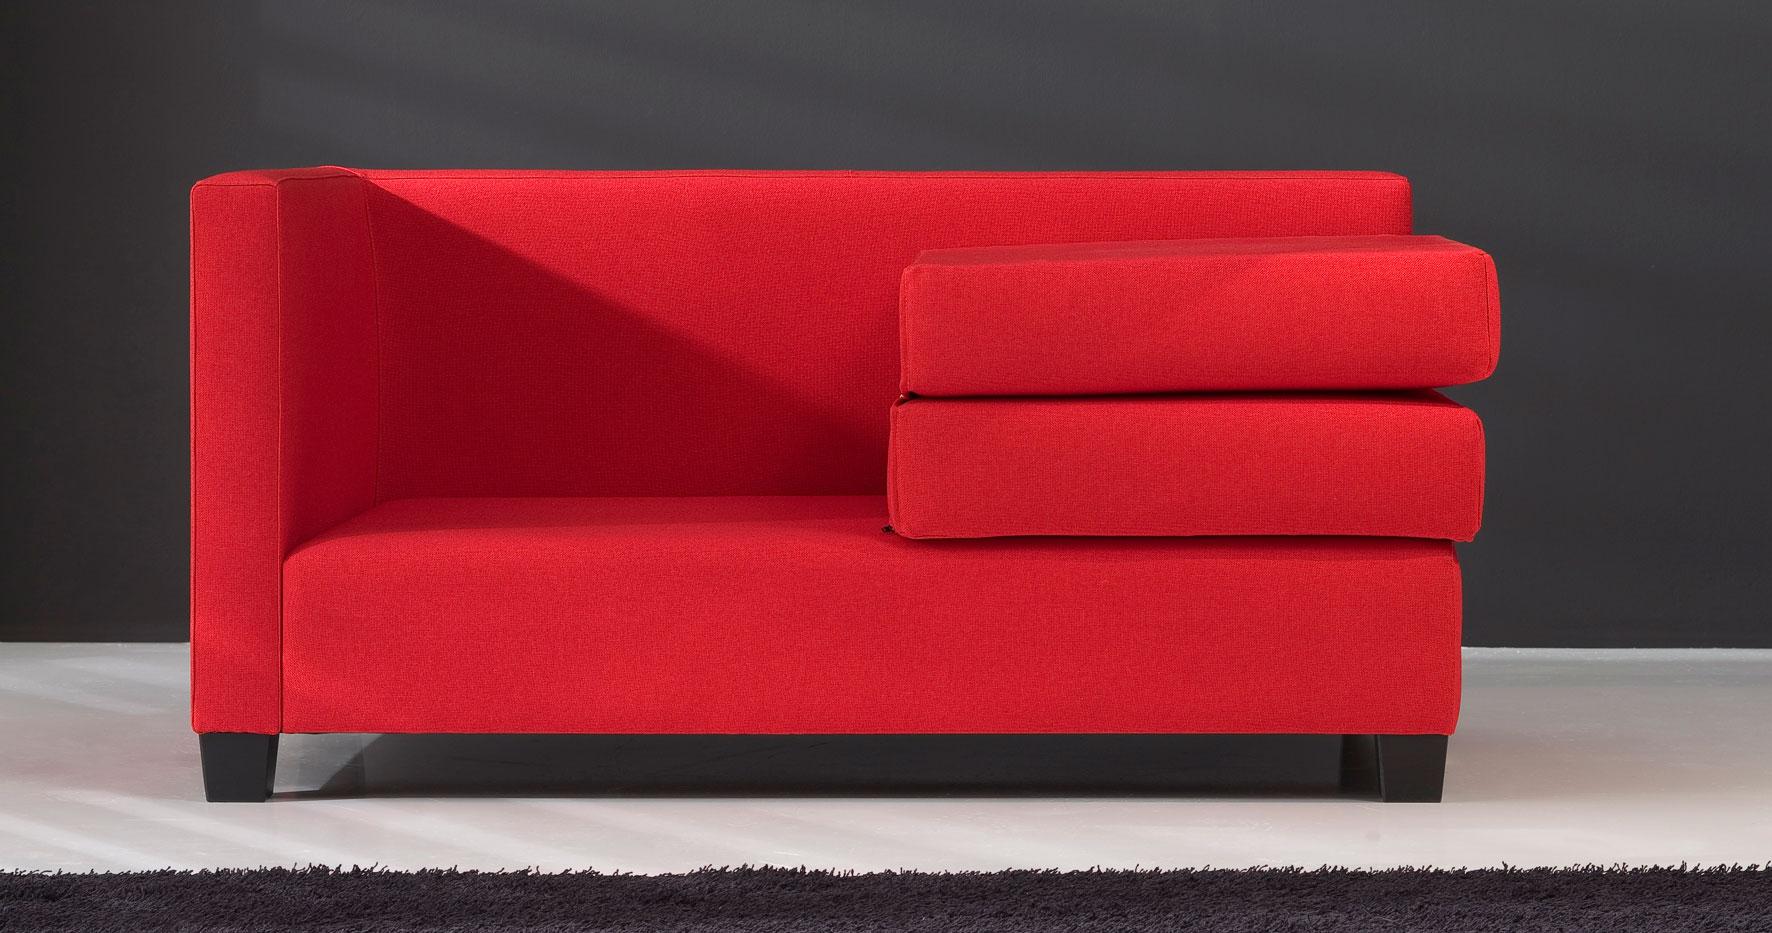 Sofá cama Moderno Luppo en COSAS de ARQUITECTOSCosas de Arquitectos